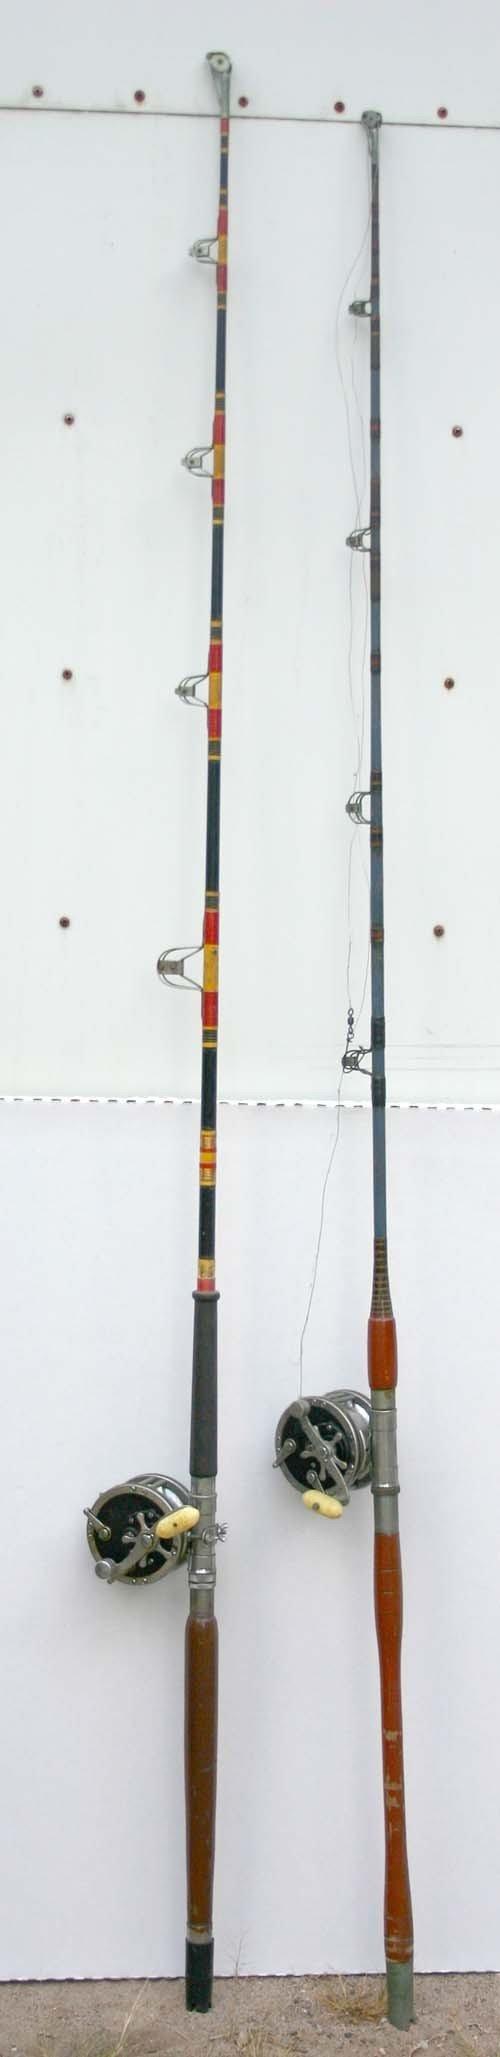 "19: 2 antique saltwater fishing poles w reels - 6'5"" &"